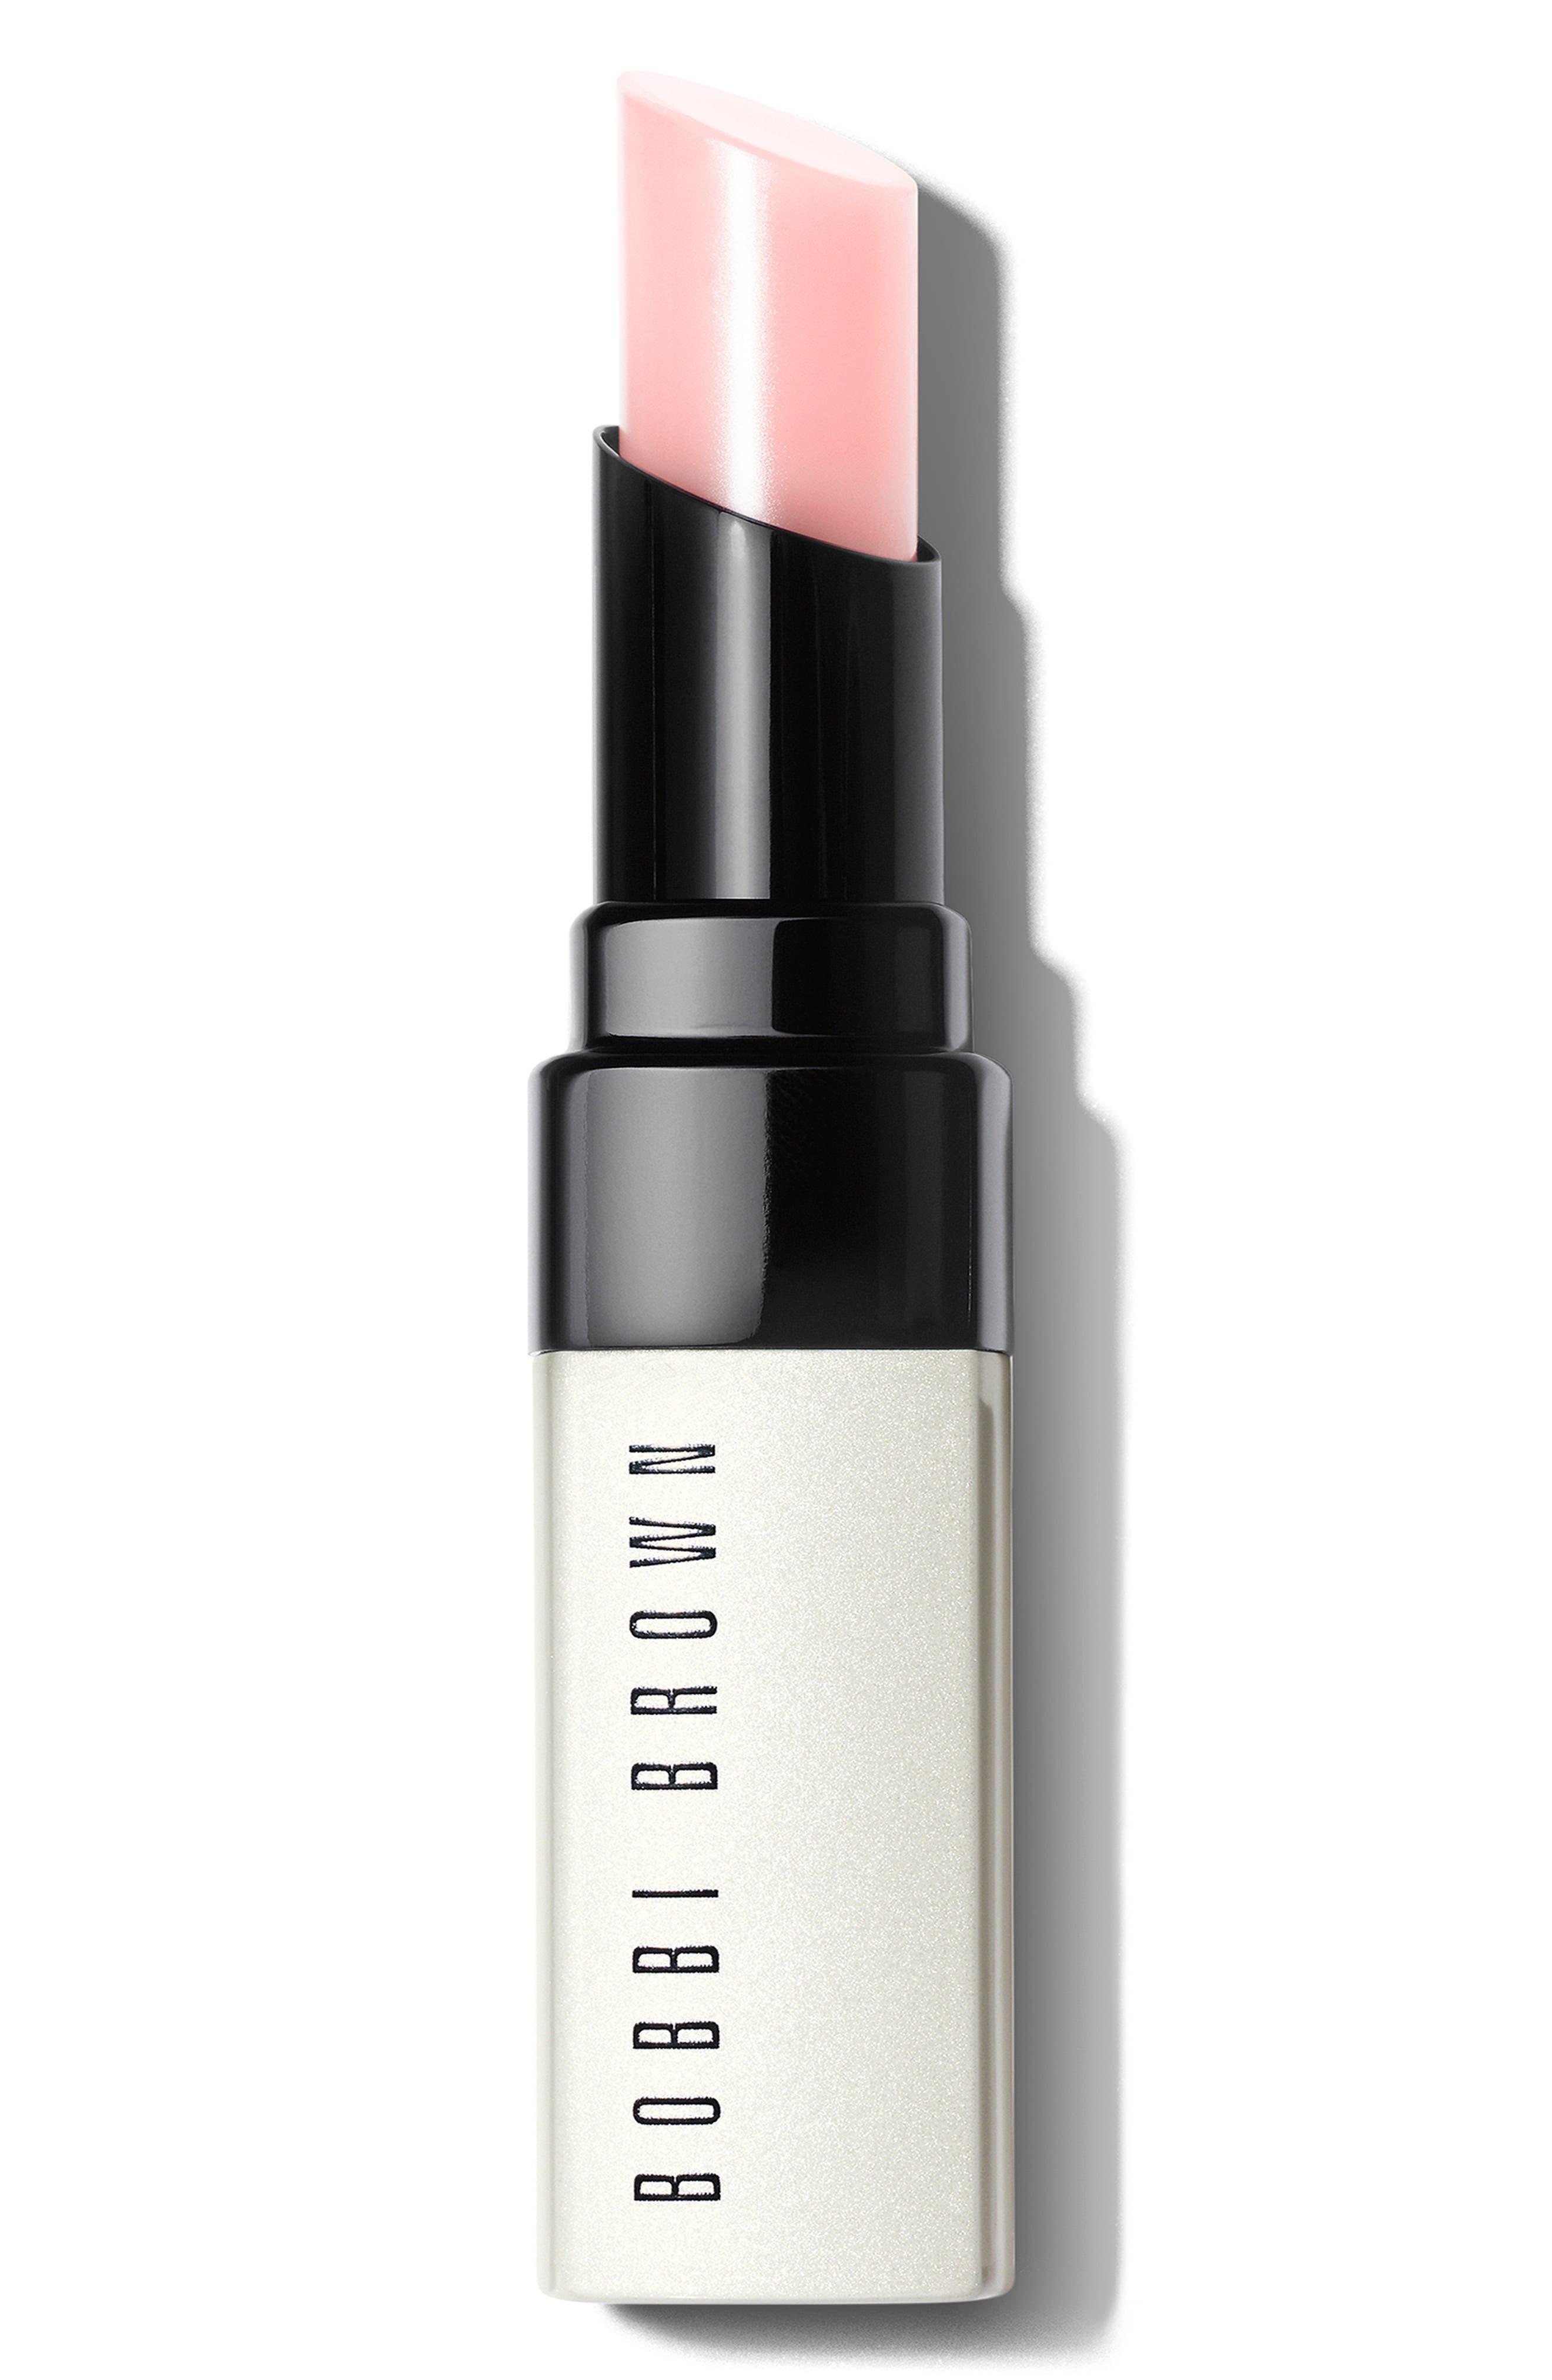 Extra Lip Tint Sheer Tinted Lip Balm